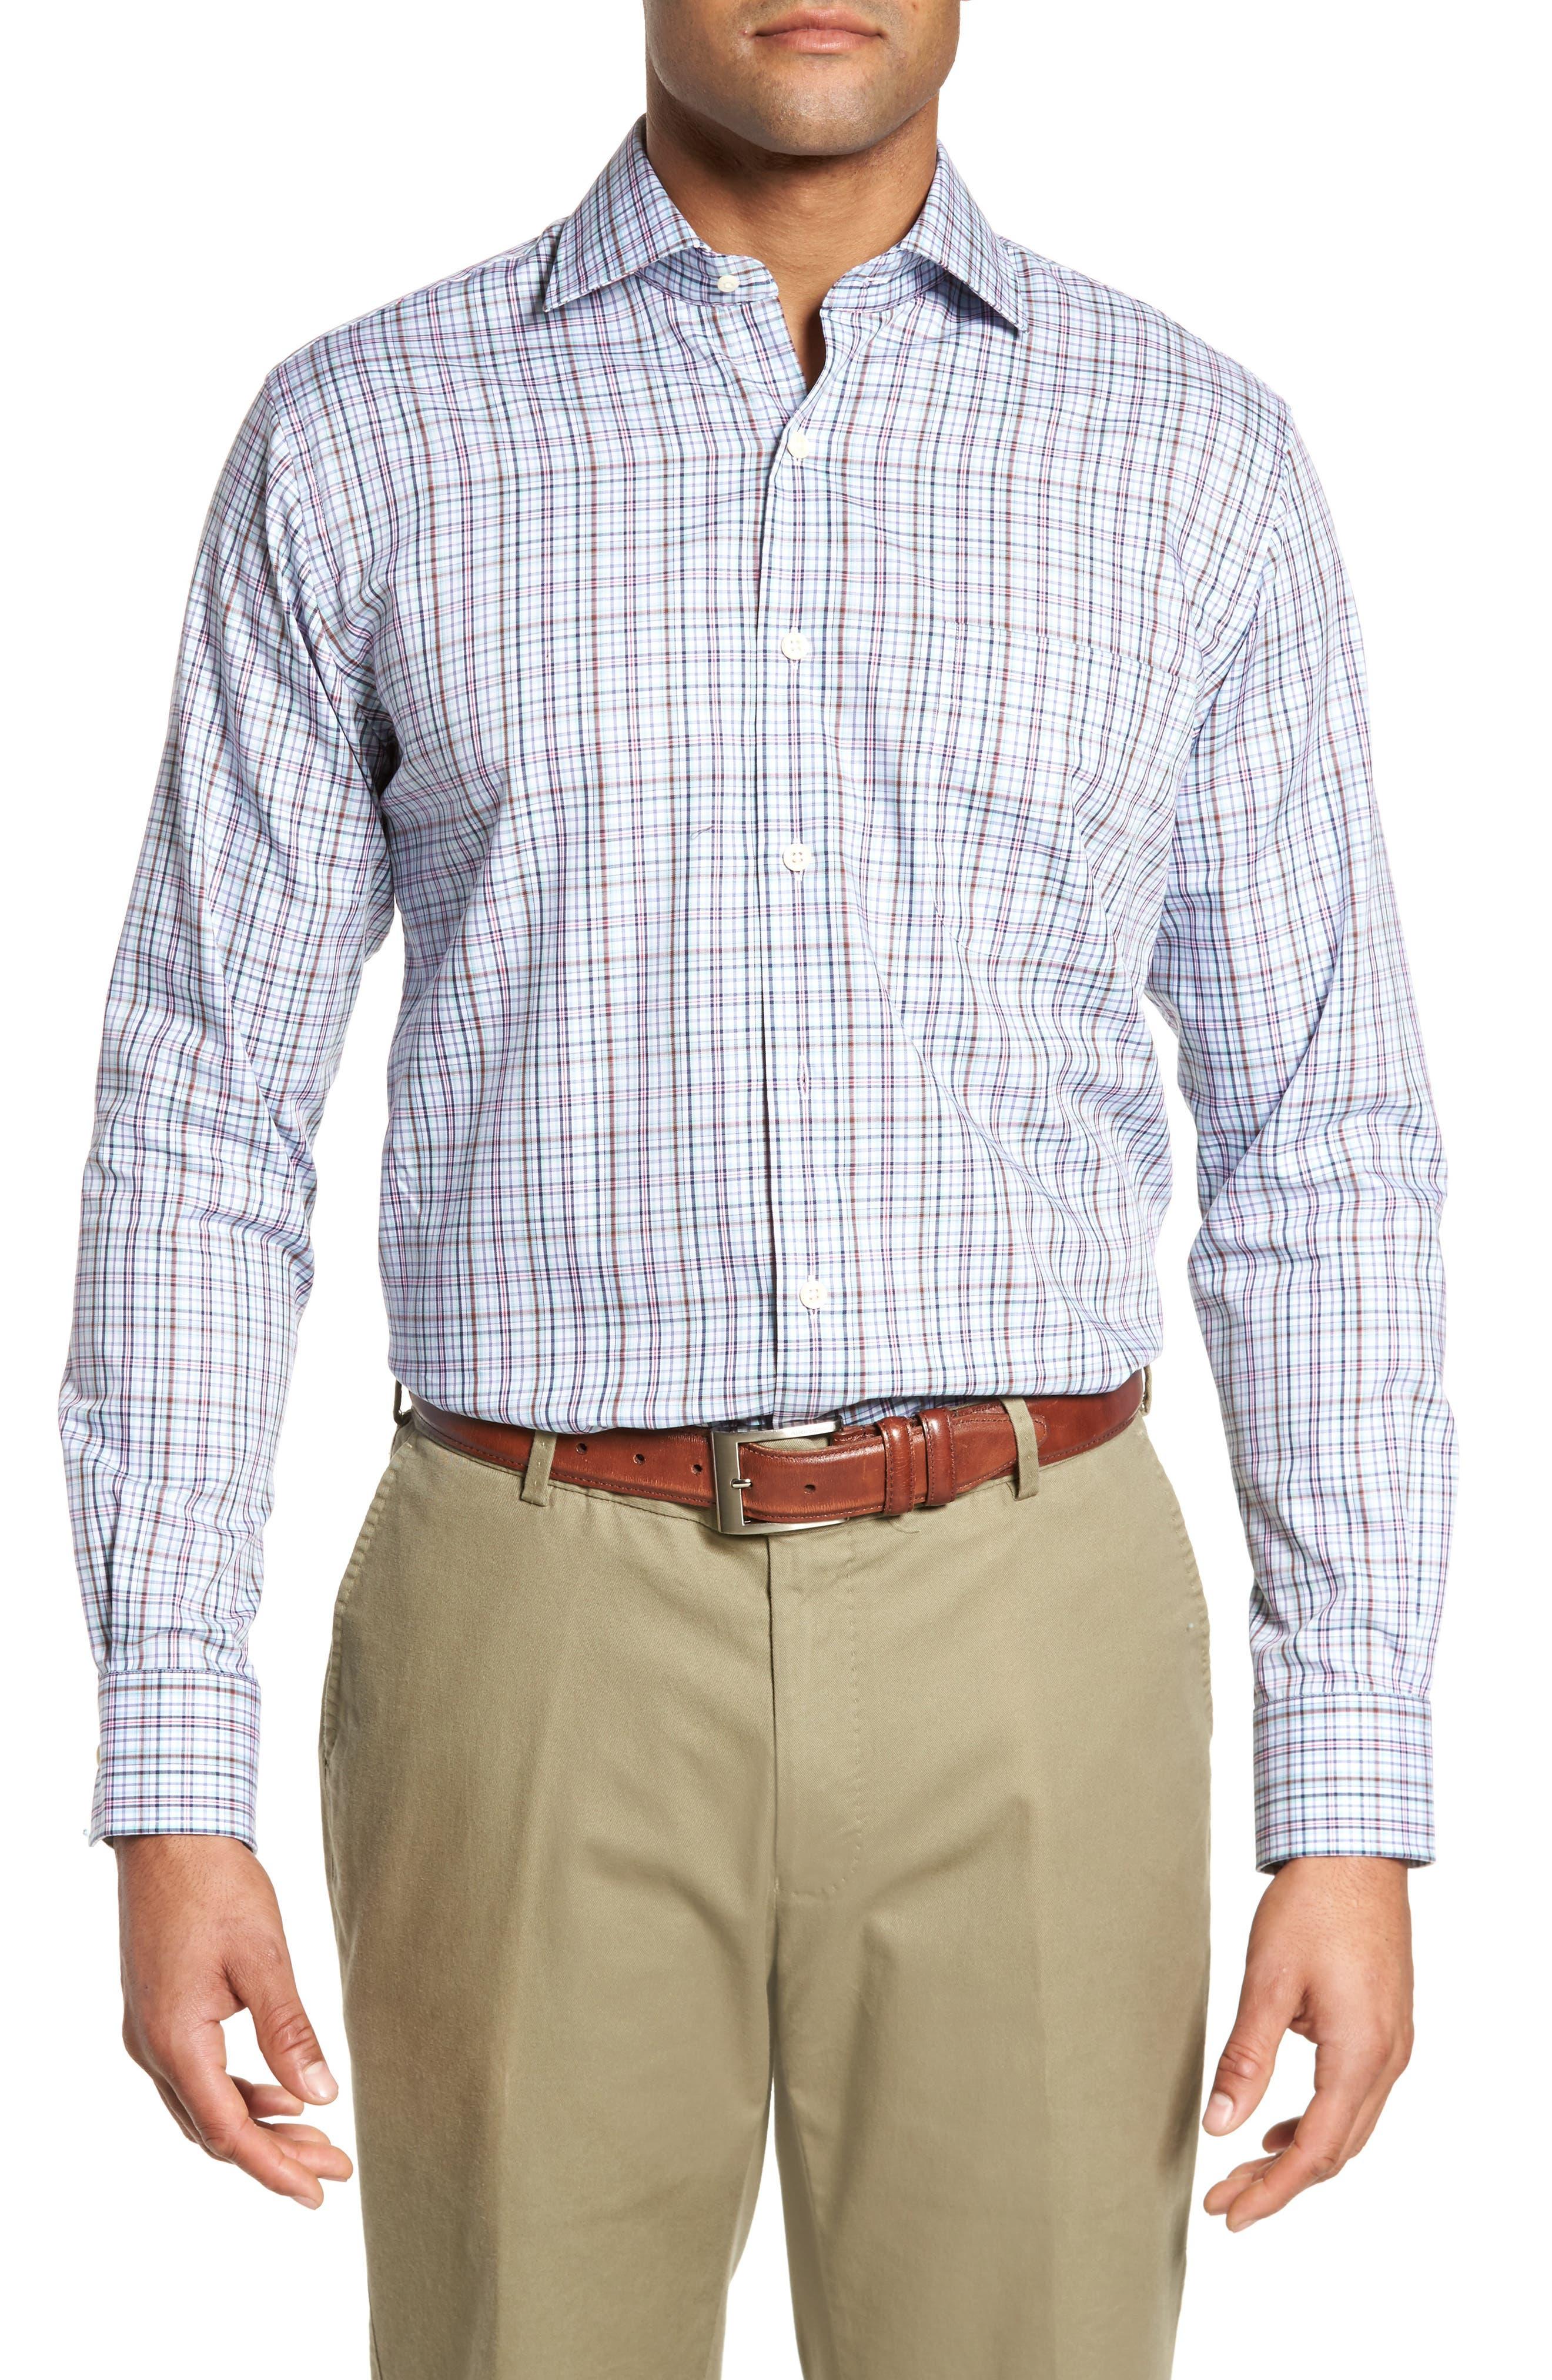 Crown Ease Tango Pinwheel Regular Fit Sport Shirt,                         Main,                         color, Tar Heel Blue